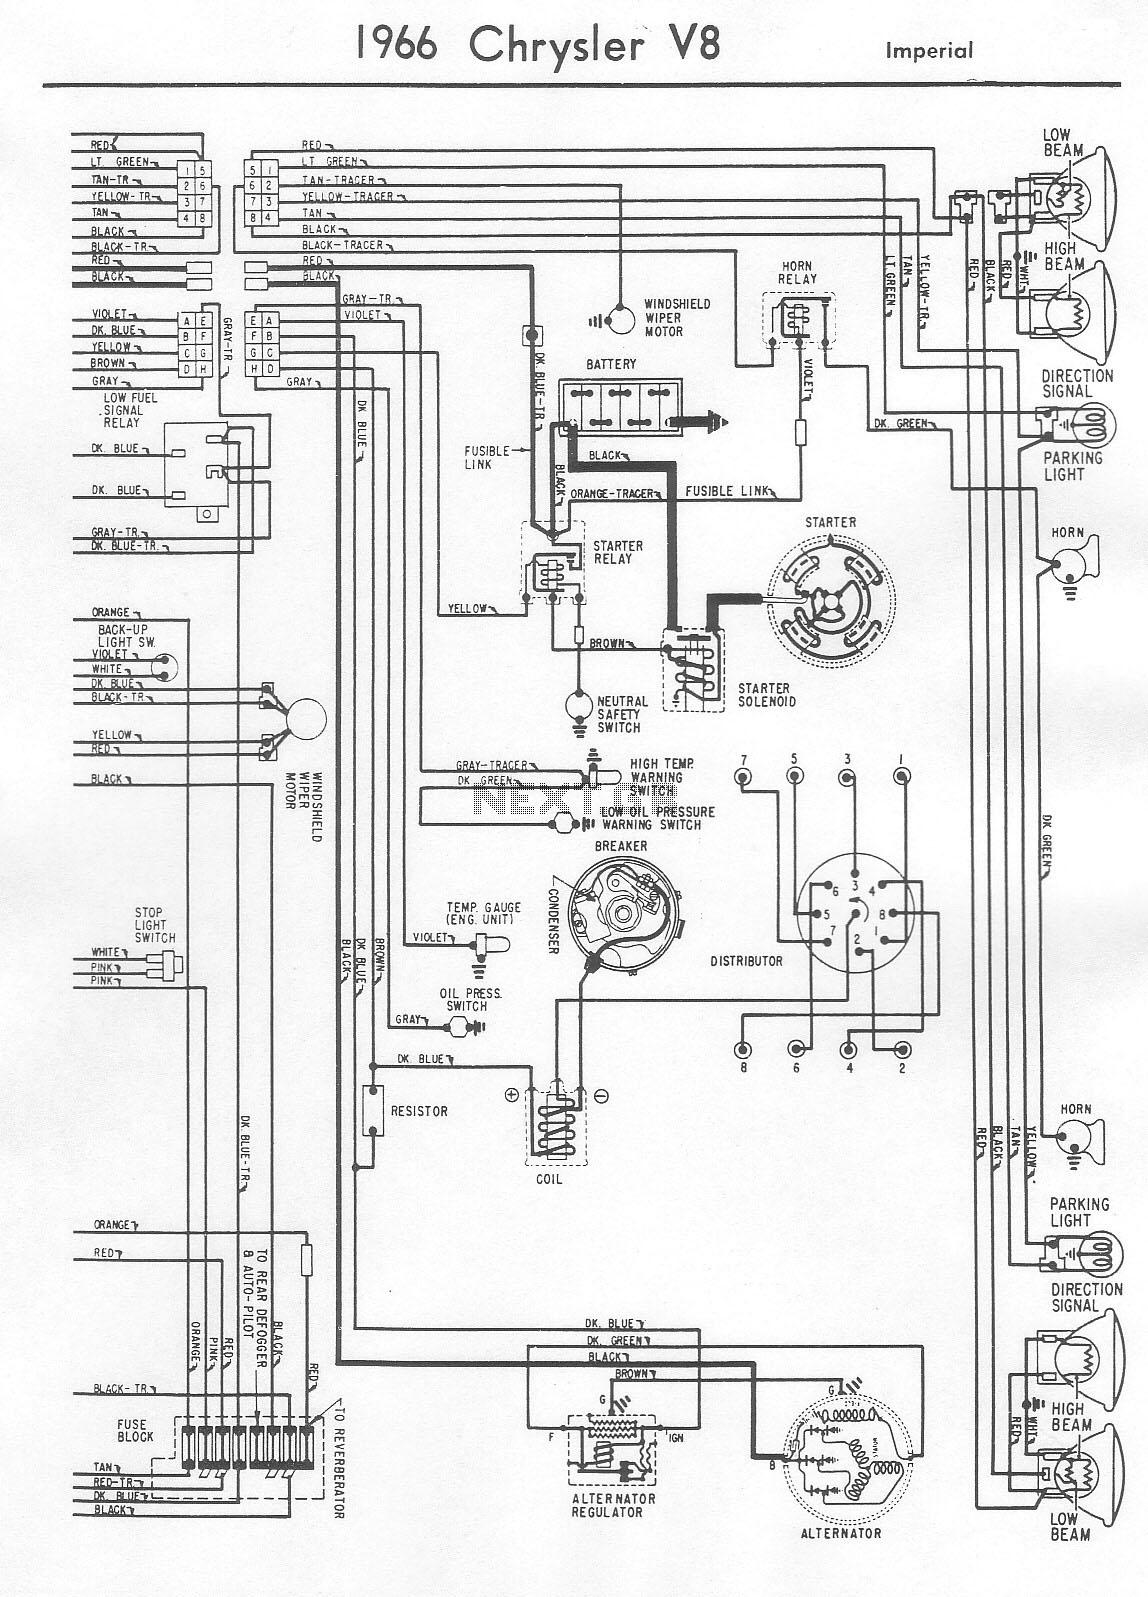 mk4 2 0 jetta engine diagram  diagrams  auto fuse box diagram